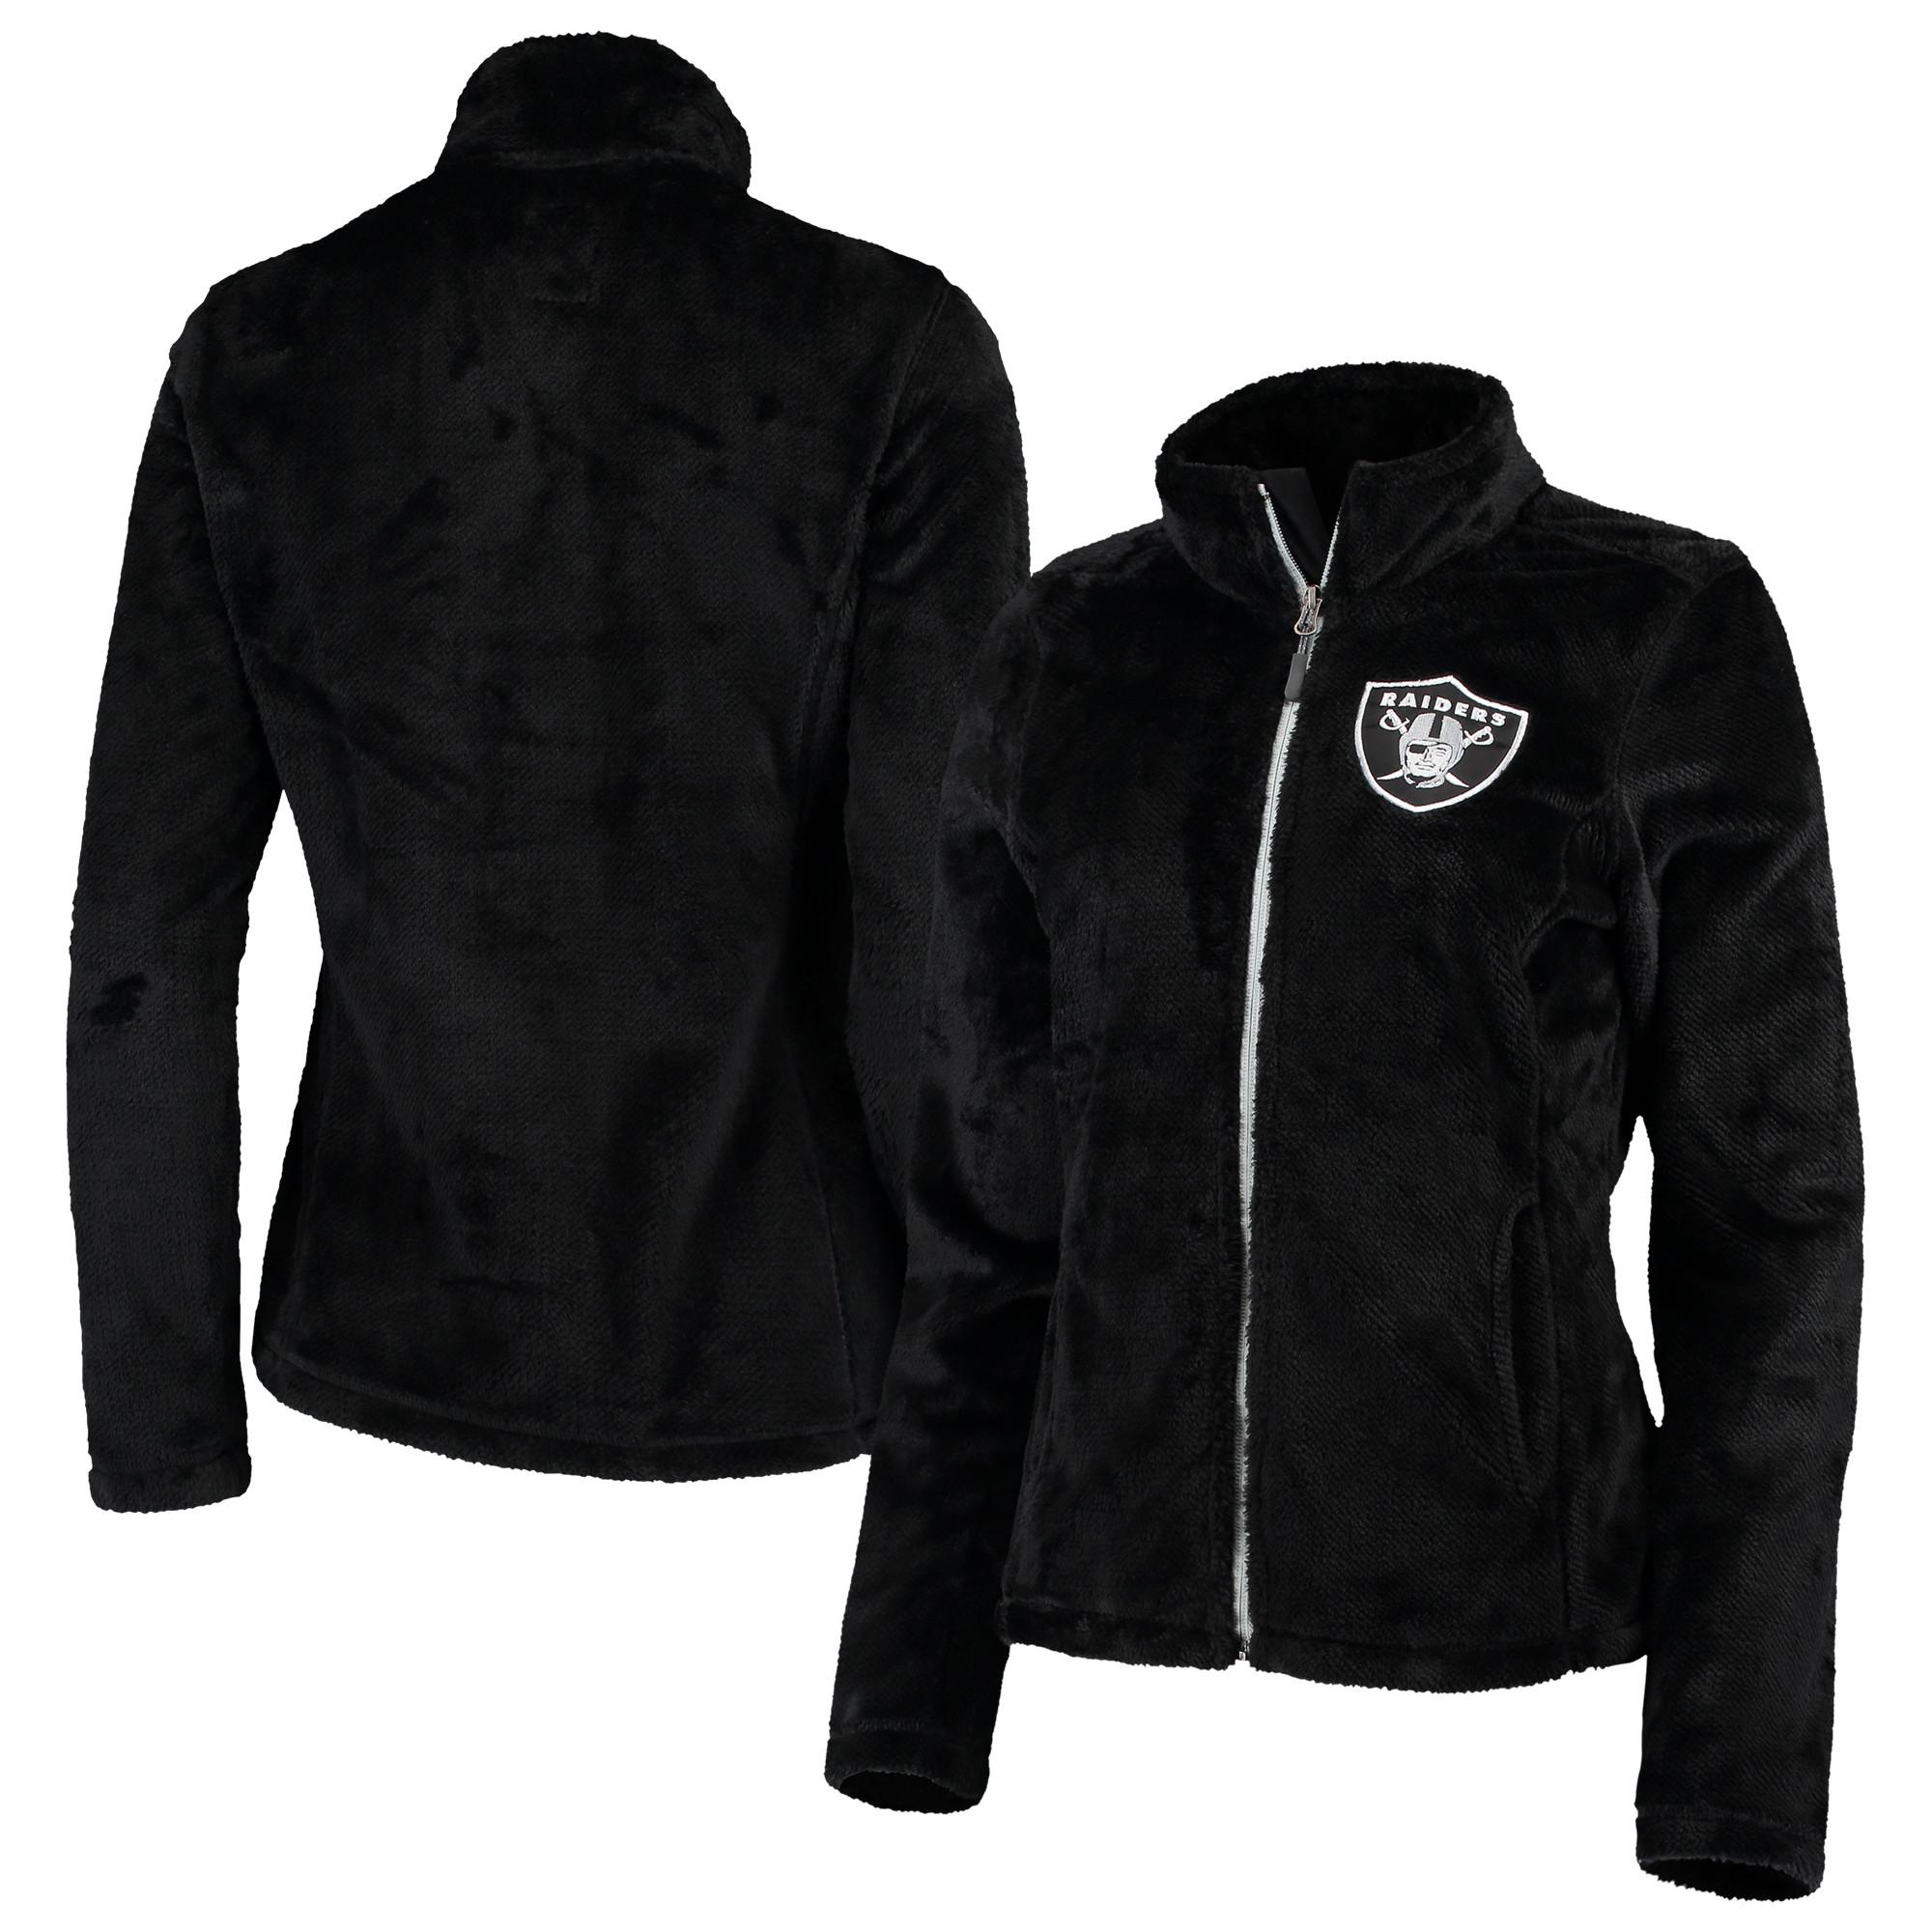 Oakland Raiders G-III 4Her by Carl Banks Women's Goal Line Full-Zip Jacket - Black